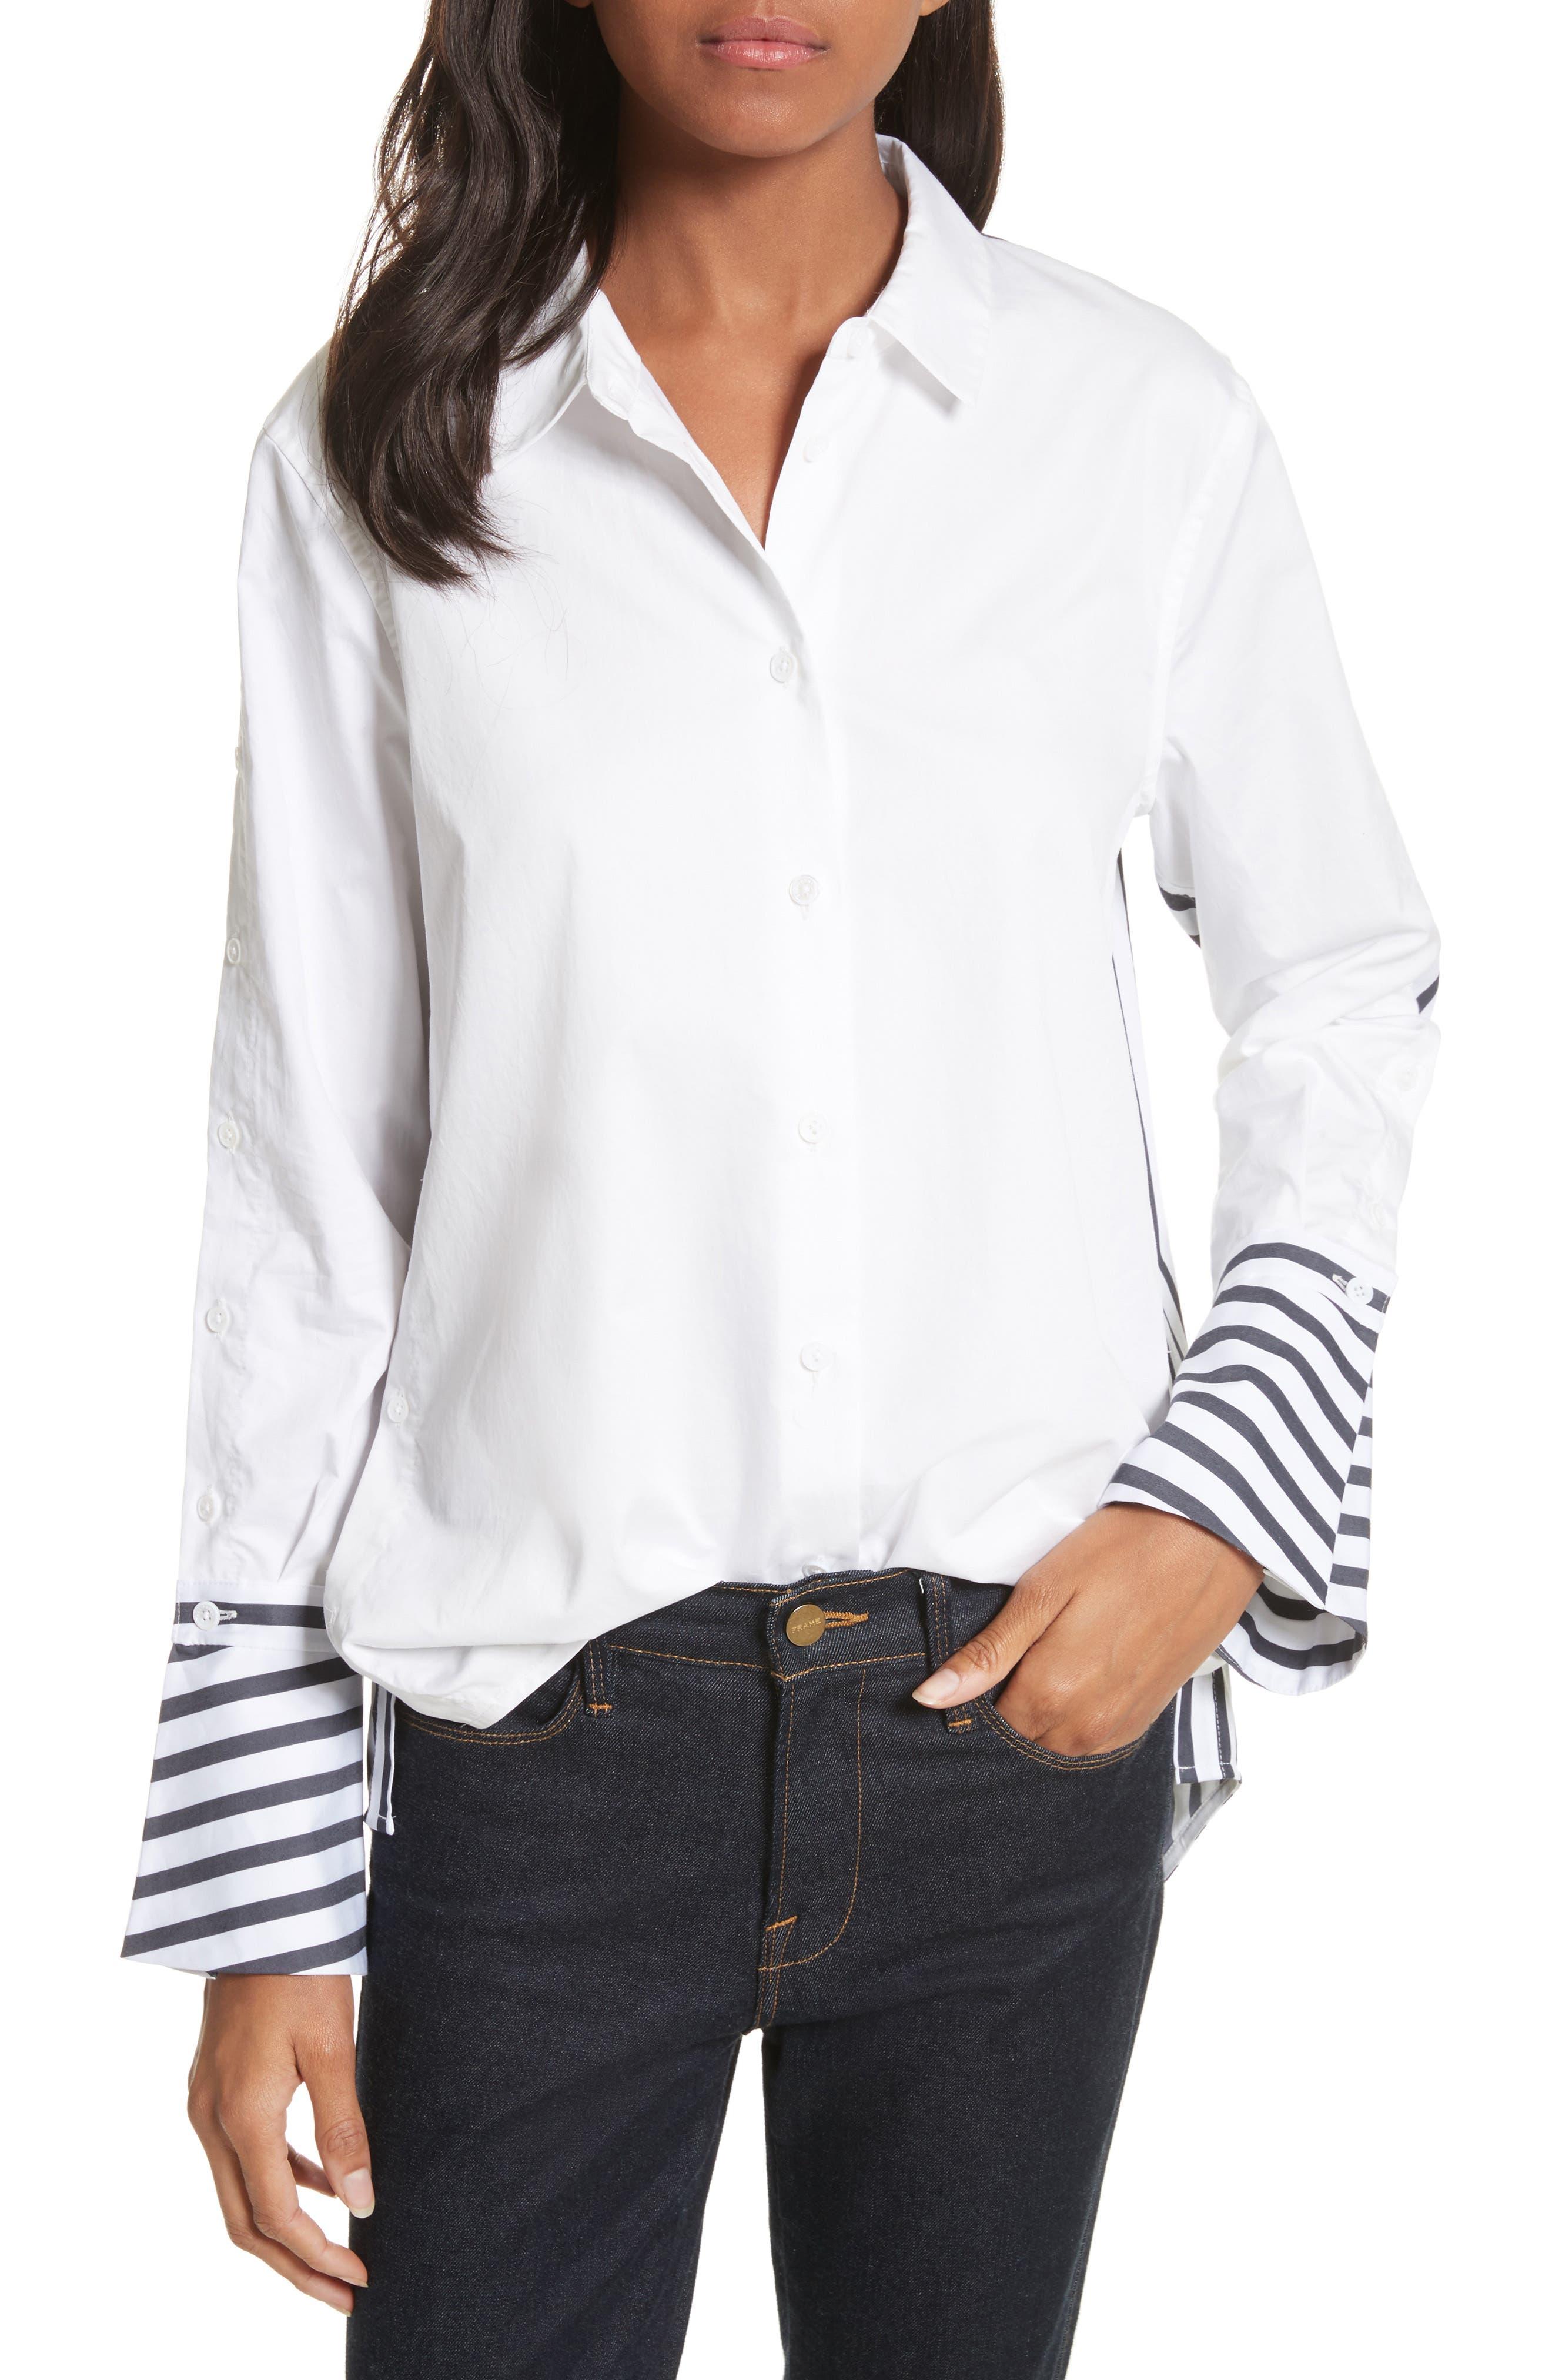 Rossi Contrast Stripe Button Down Shirt,                         Main,                         color, Bright White/ Eclipse